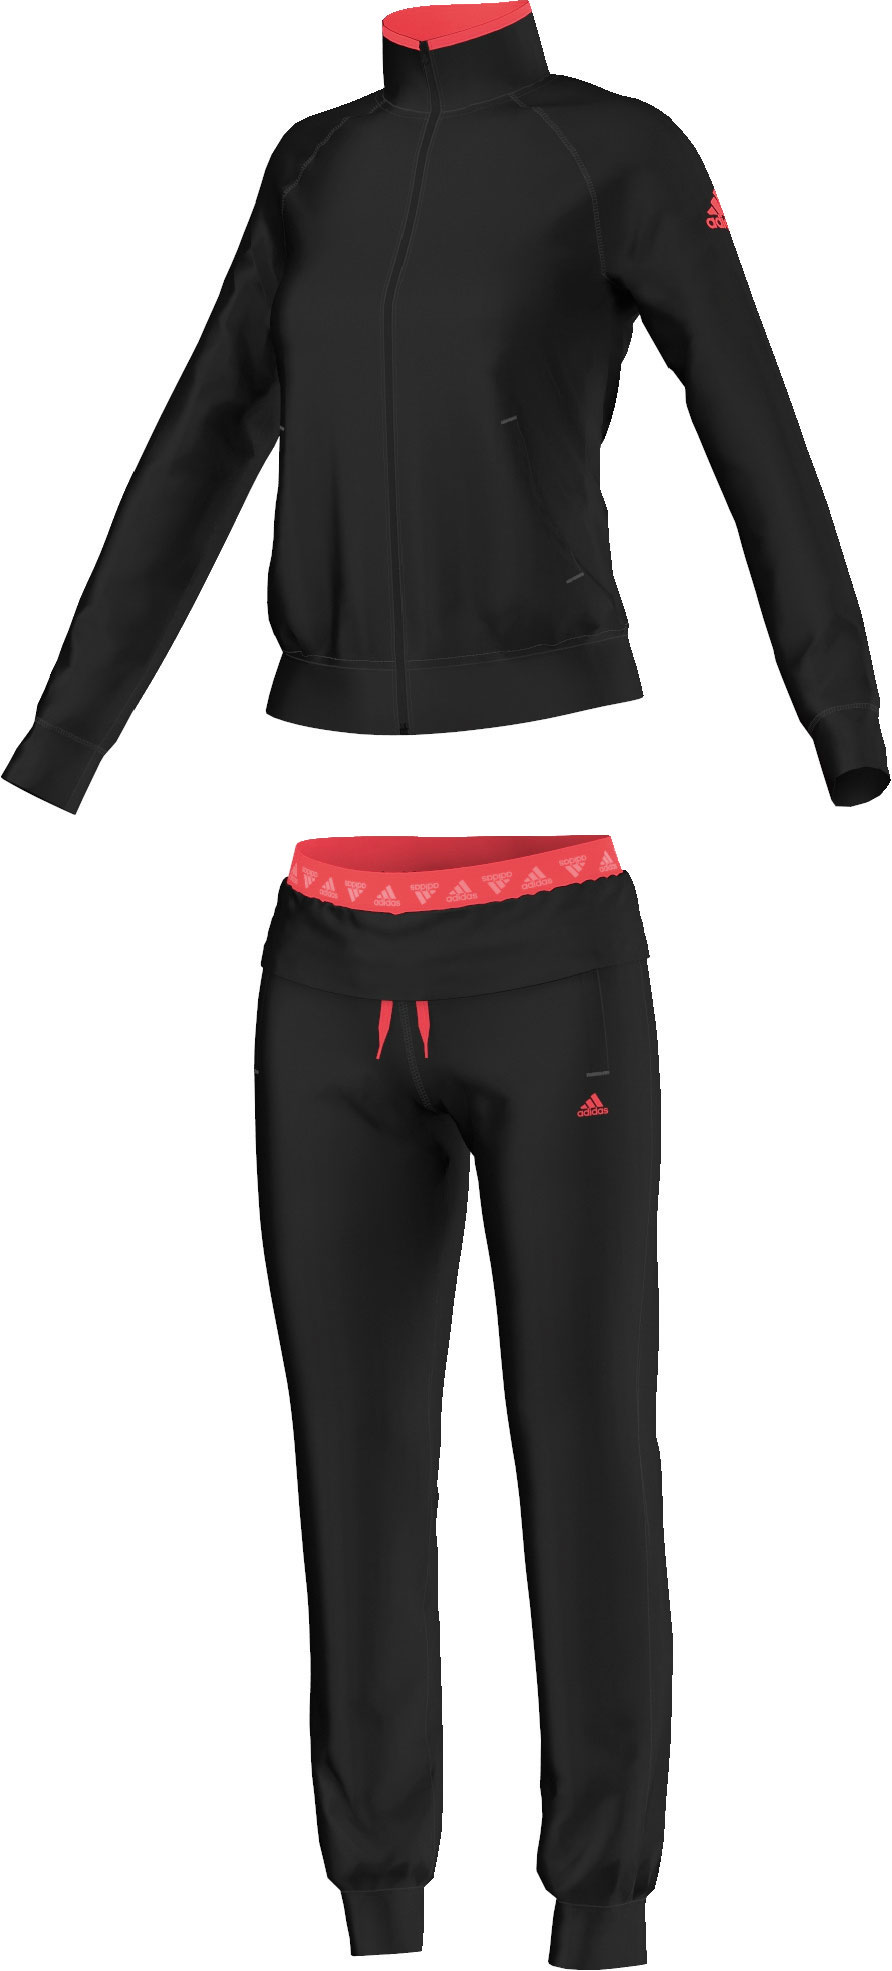 adidas damen trainingsanzug logo tracksuit ebay. Black Bedroom Furniture Sets. Home Design Ideas